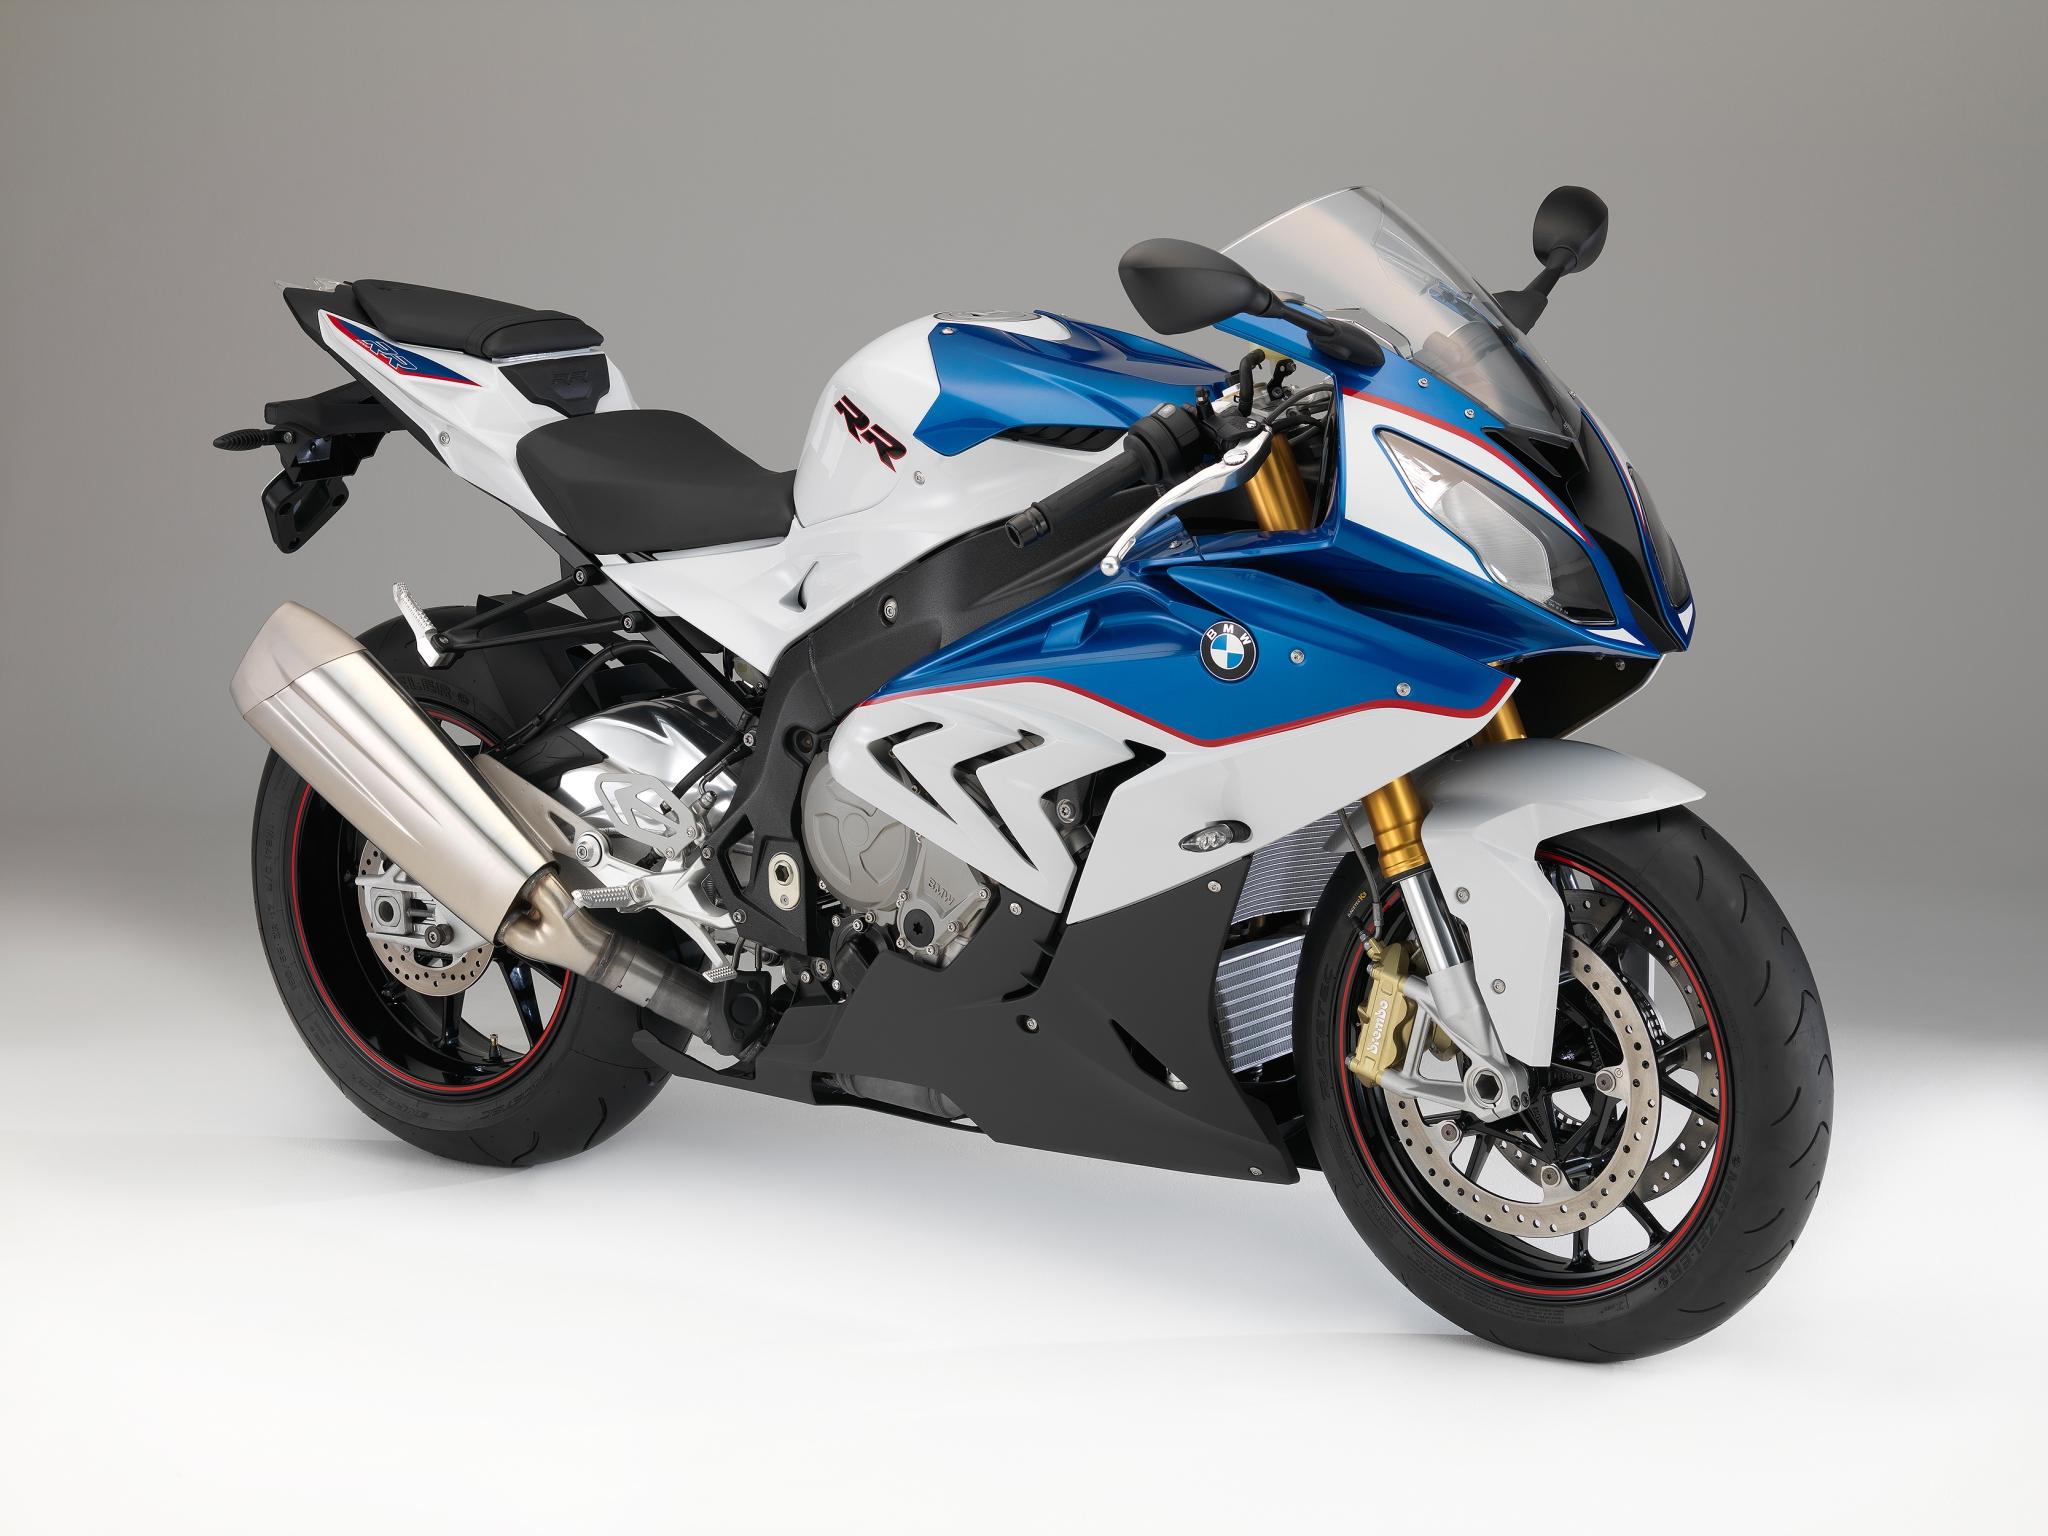 BMW Updates The 2015 S1000RR